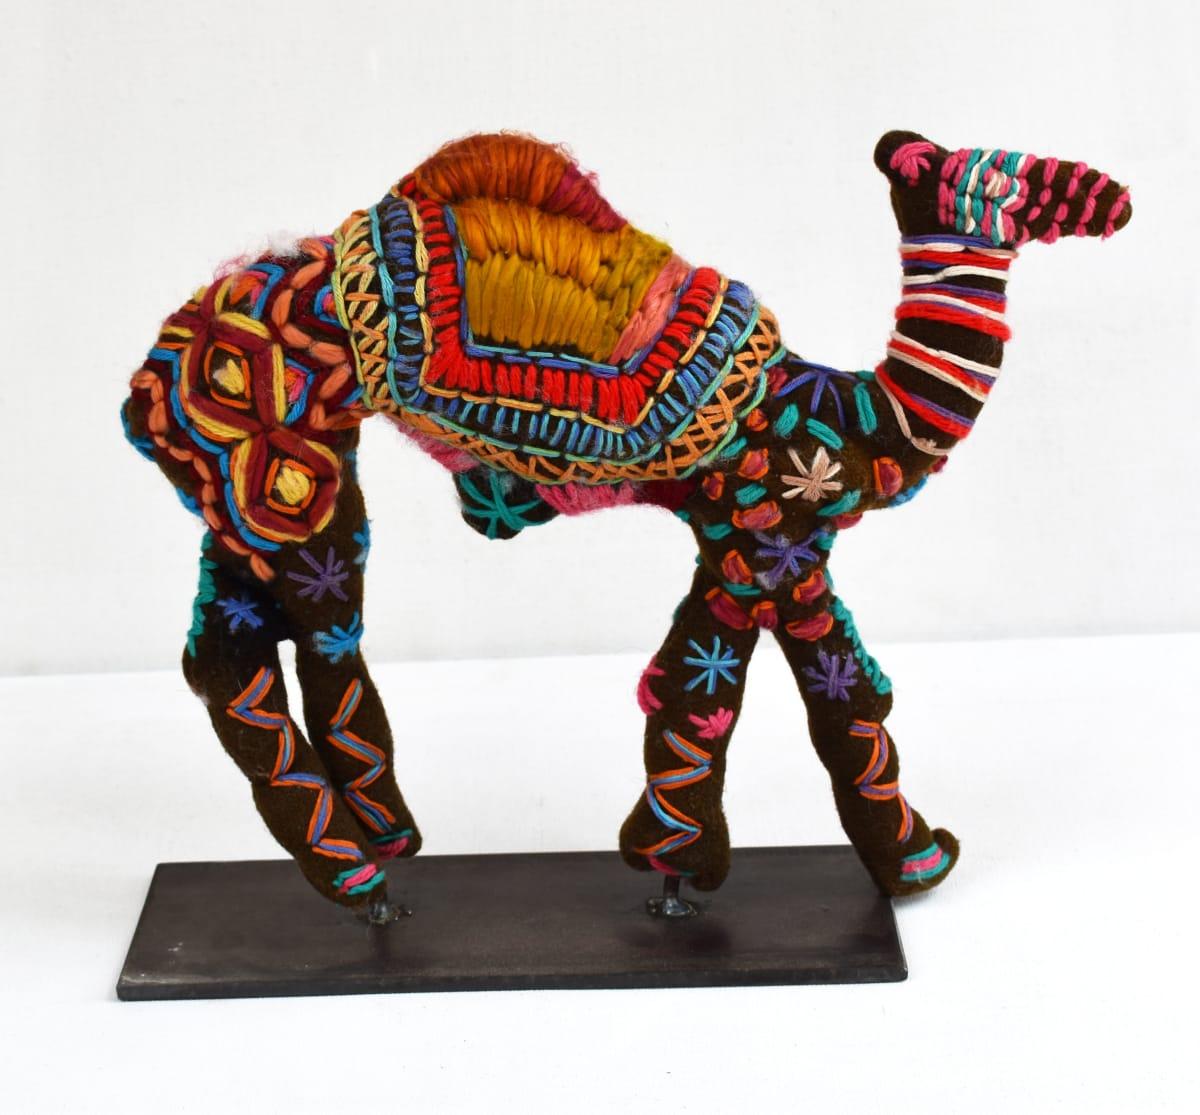 Roxanne Oliver Camel mixed media 35 x 30 x 8 cm